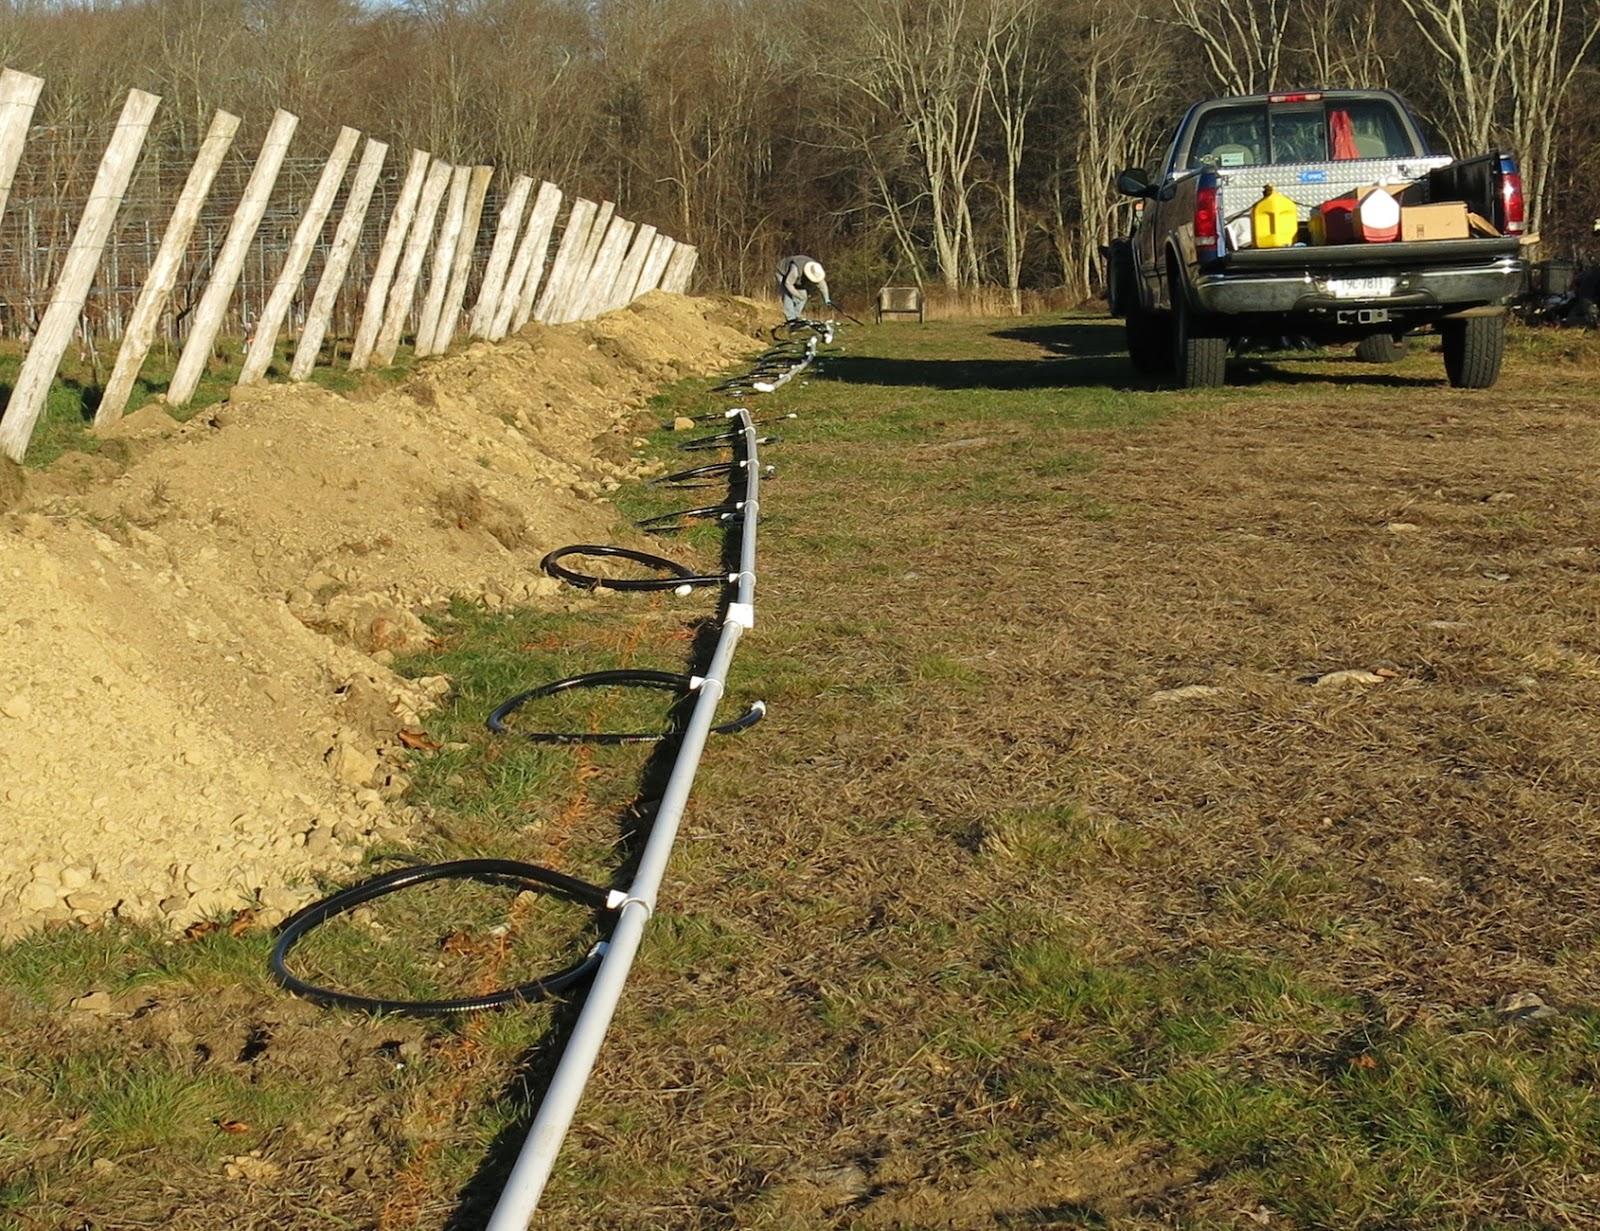 8 Irrigation Pipe - Acpfoto